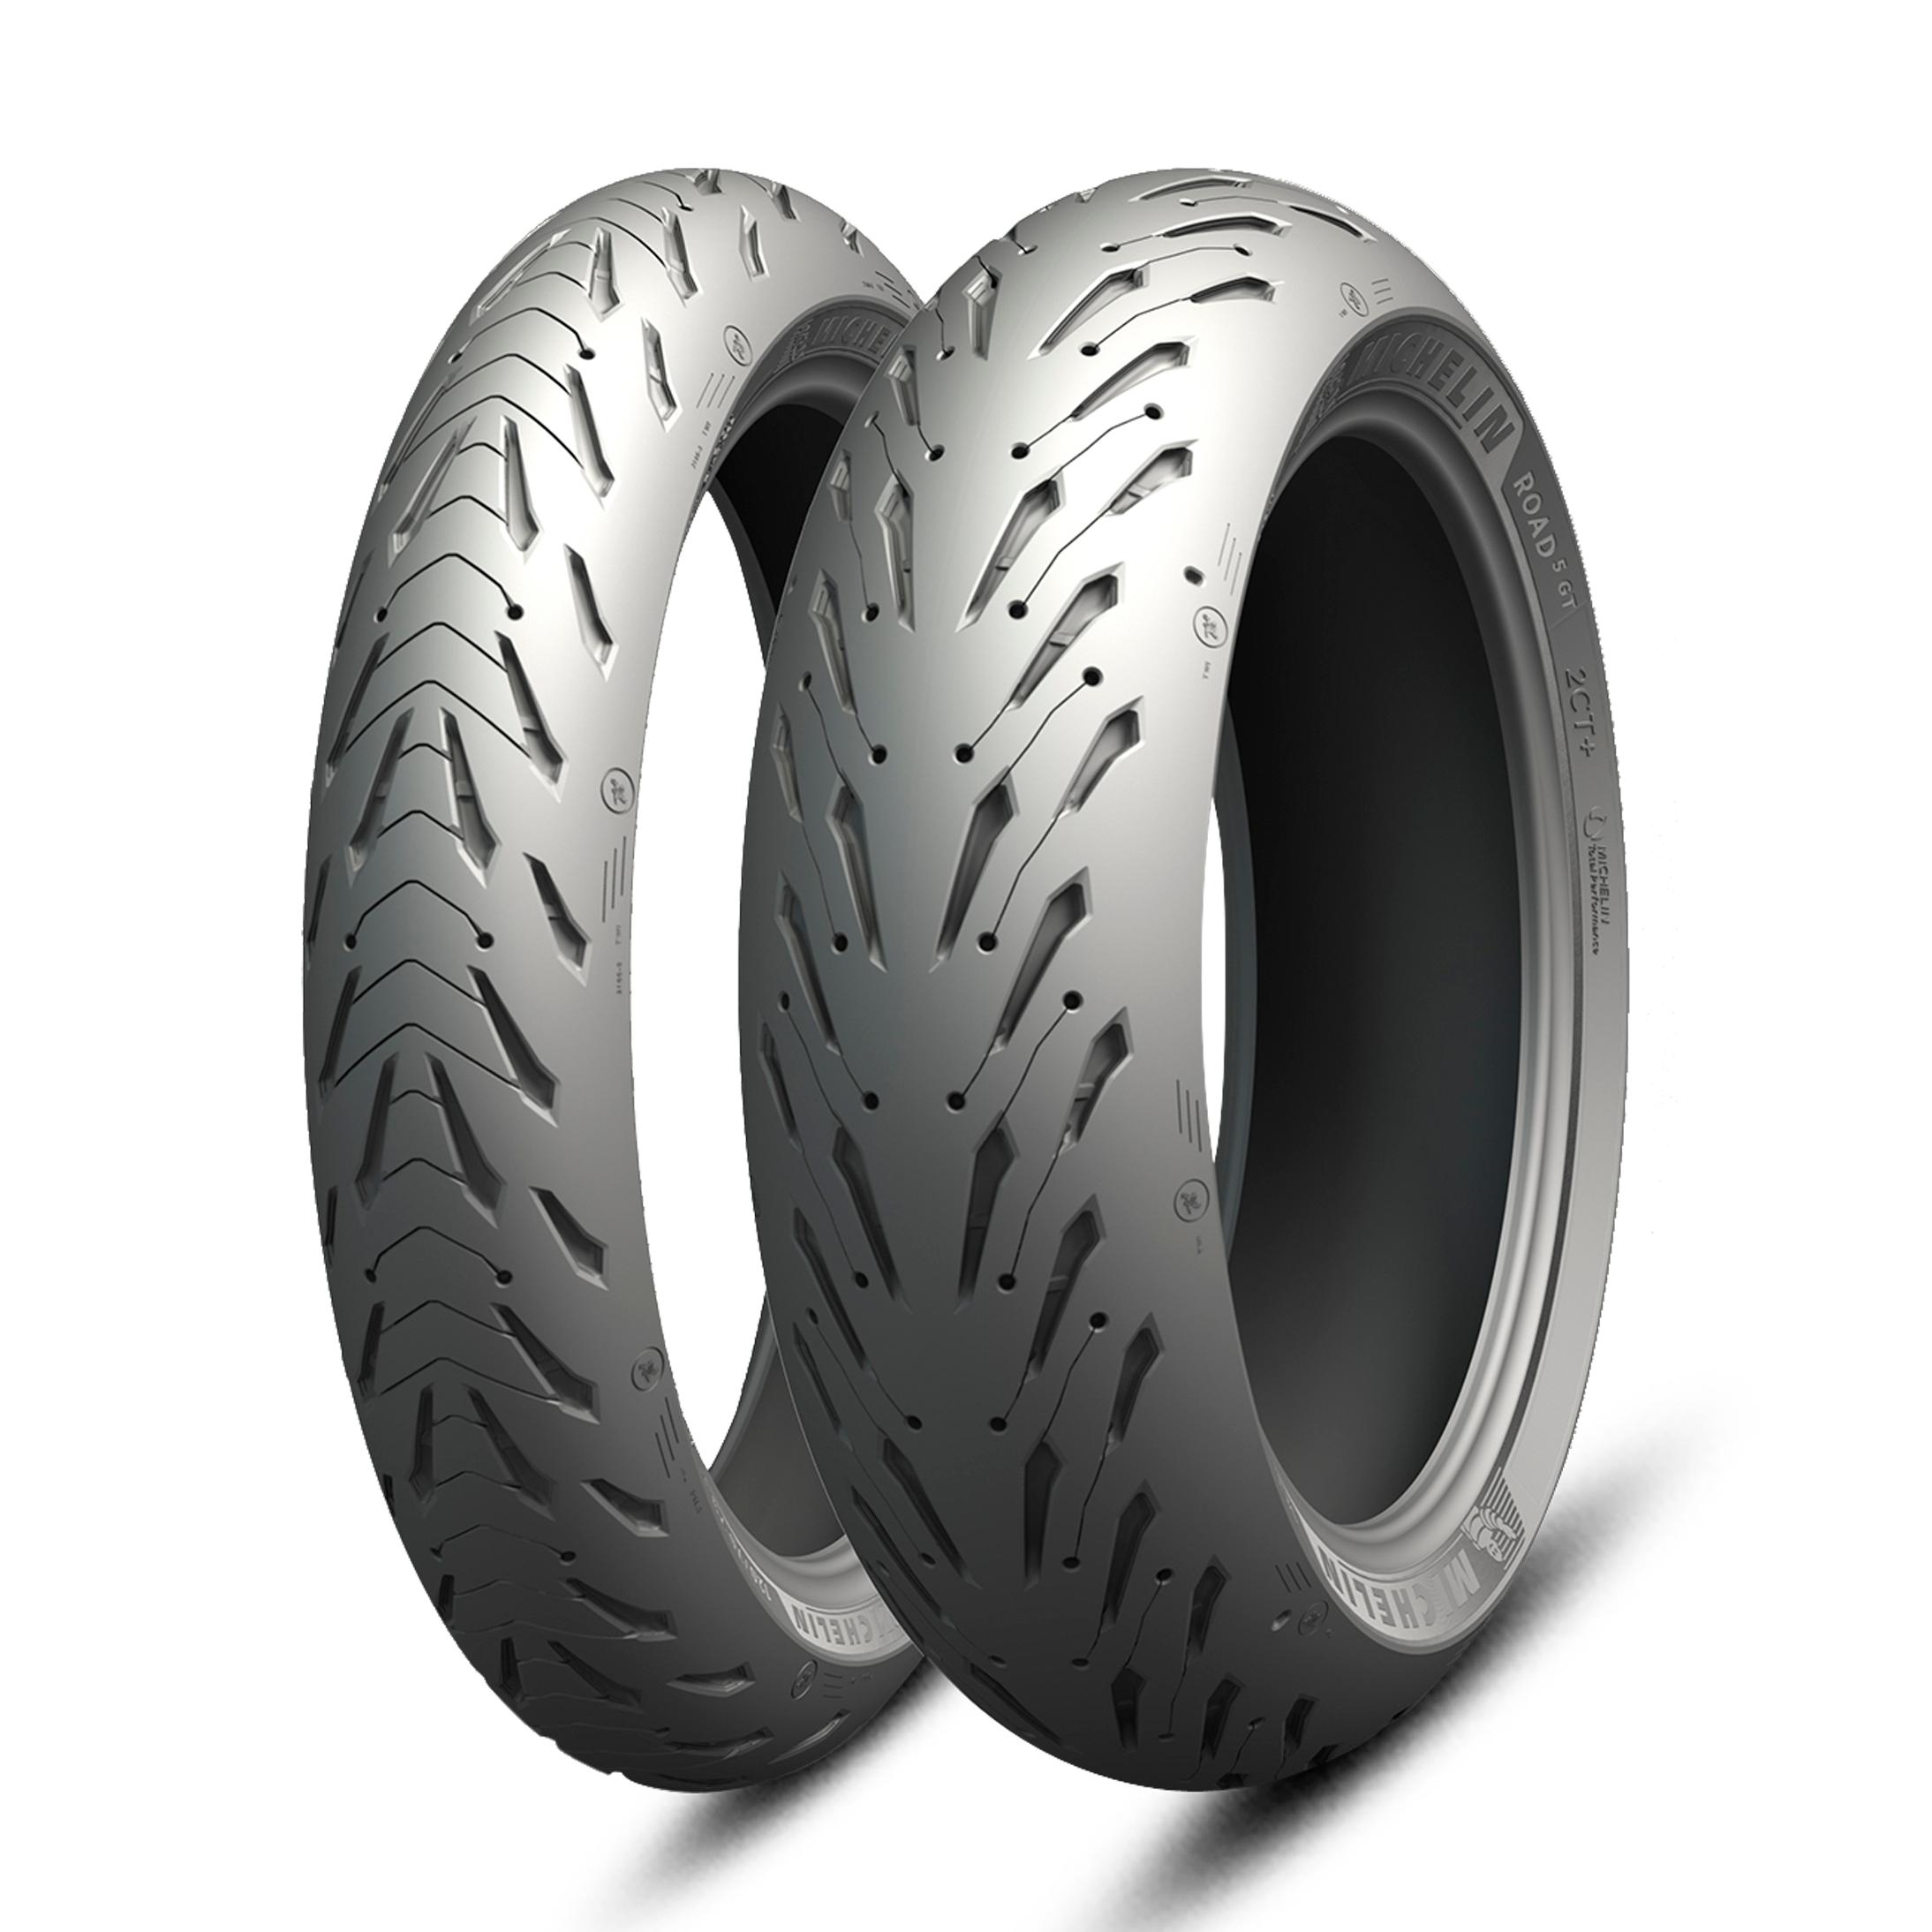 Michelin Pneu Arrière Michelin Road 5 GT Touring